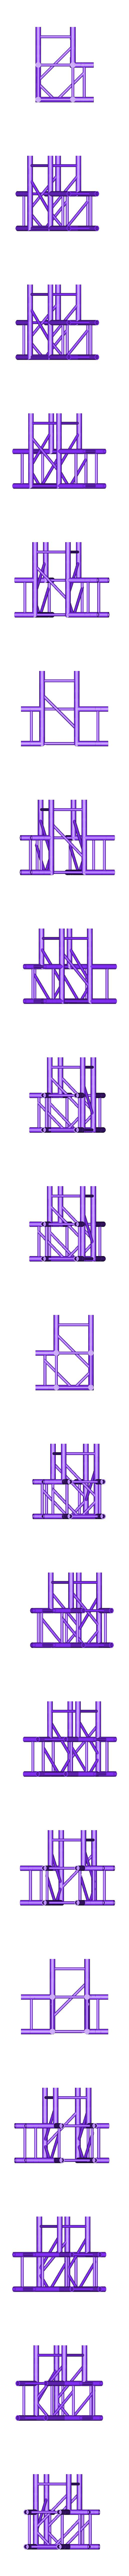 Truss 4 Punkt Traverse GWX031 4-Weg Ecke 90° Sondermaß (x1).stl Download STL file 1:18 Truss 4 Punkt Traverse Messestand ZSB1000 • Template to 3D print, CrossModellbau